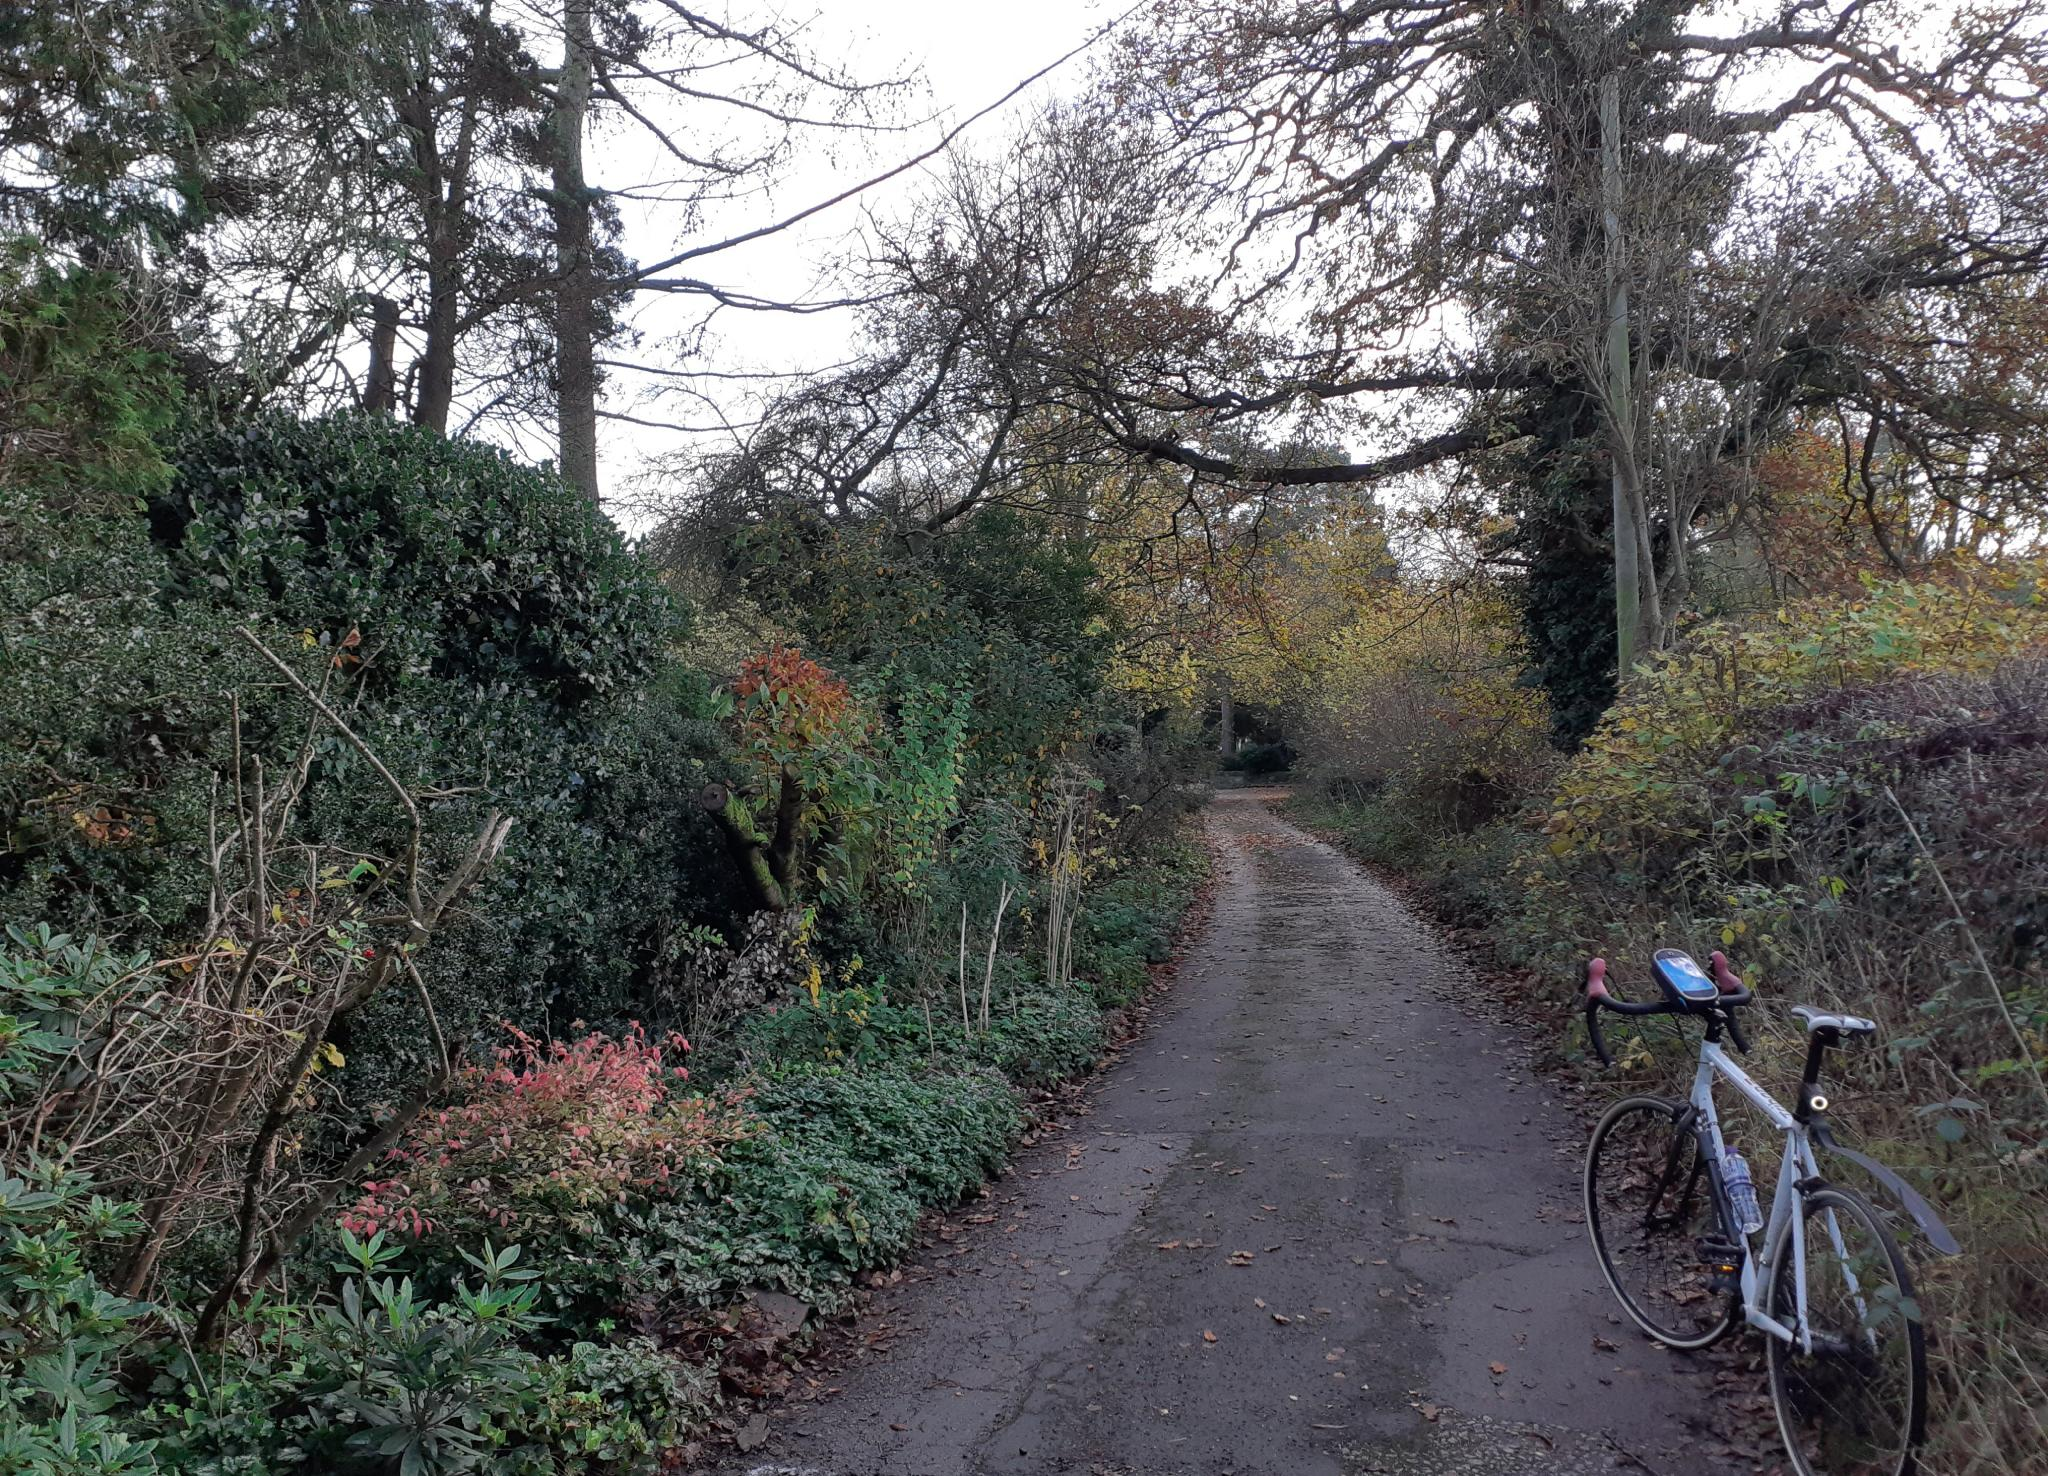 On my bike-20201109_213725-jpg